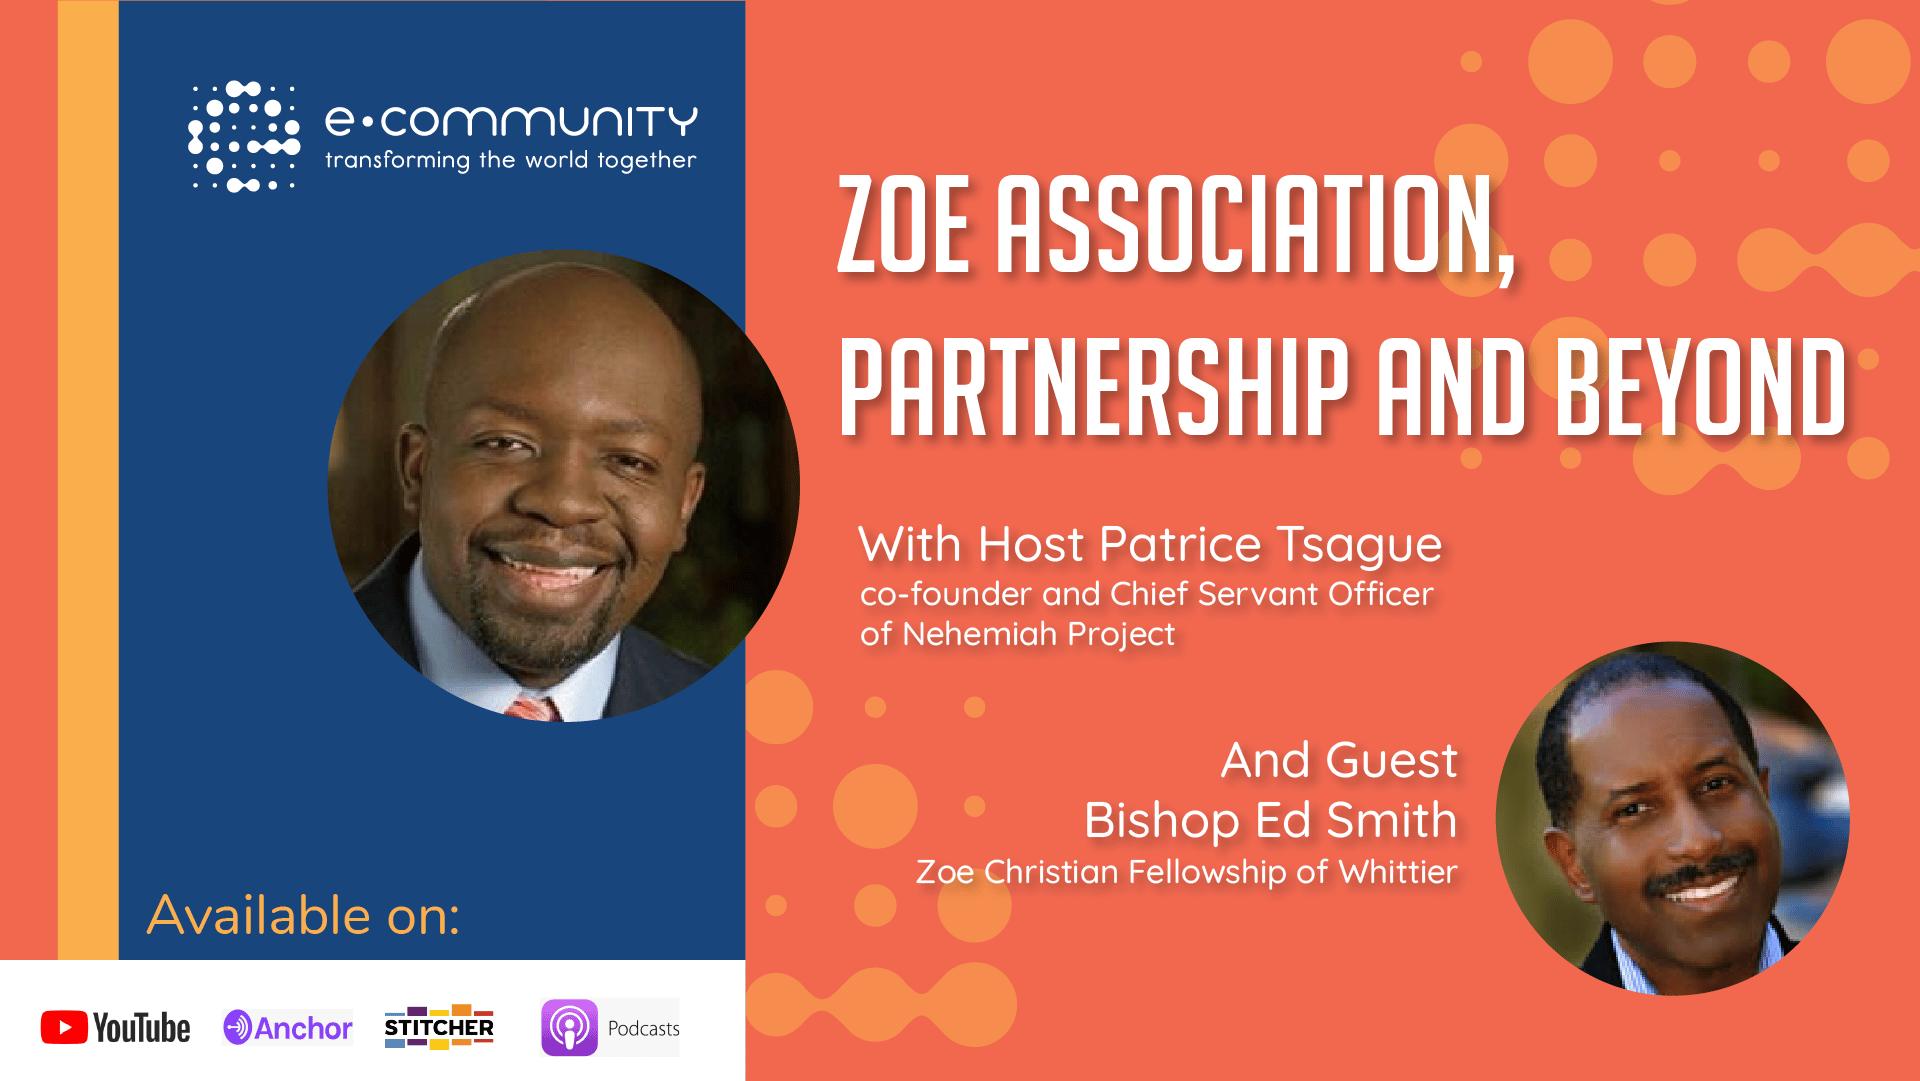 Zoe Association, partnership and beyond